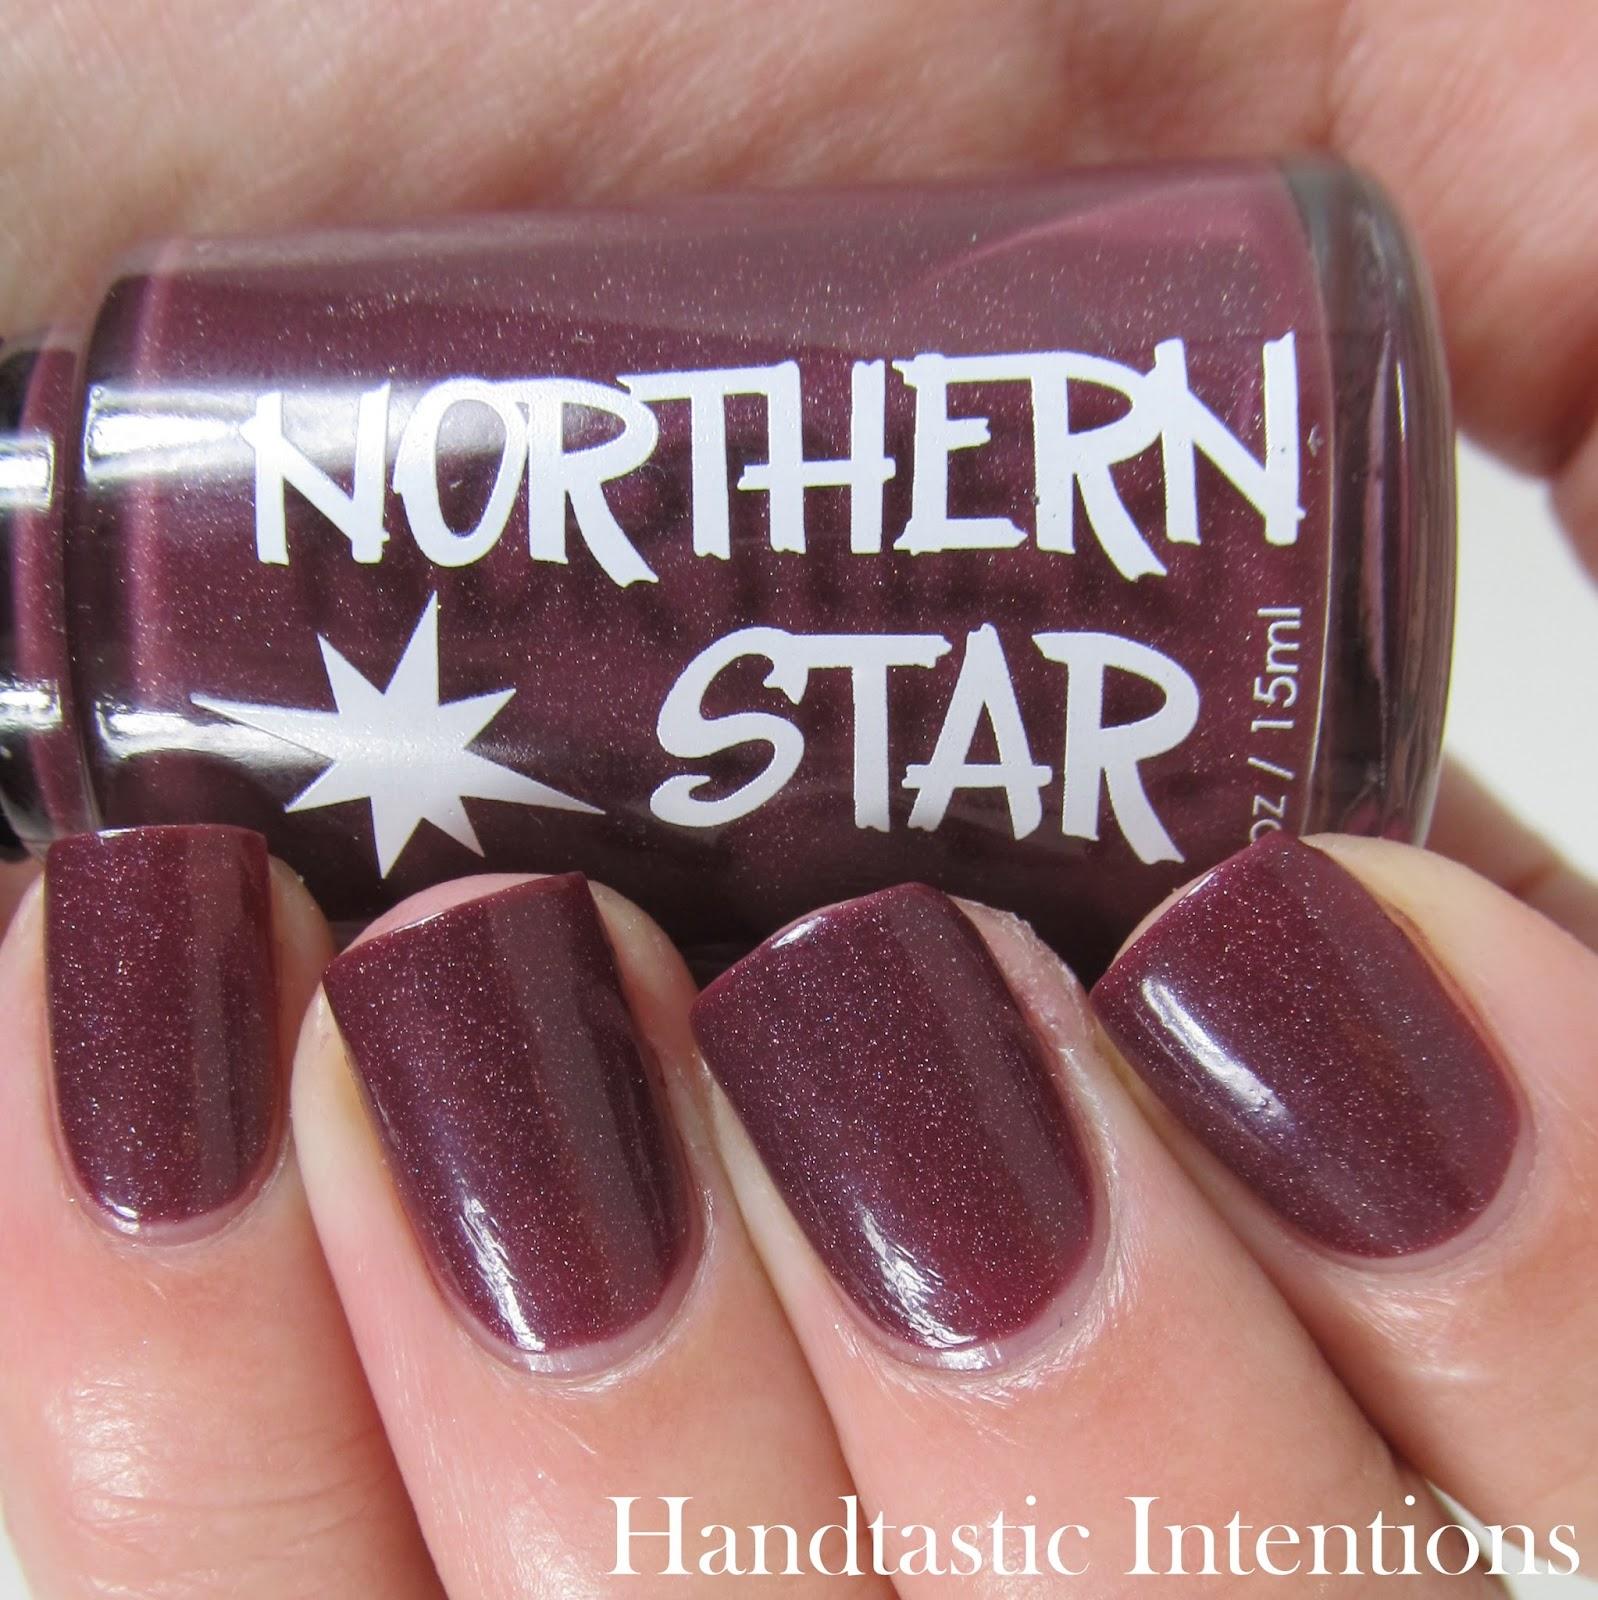 Handtastic Intentions: Northern Star Polish Marsala!